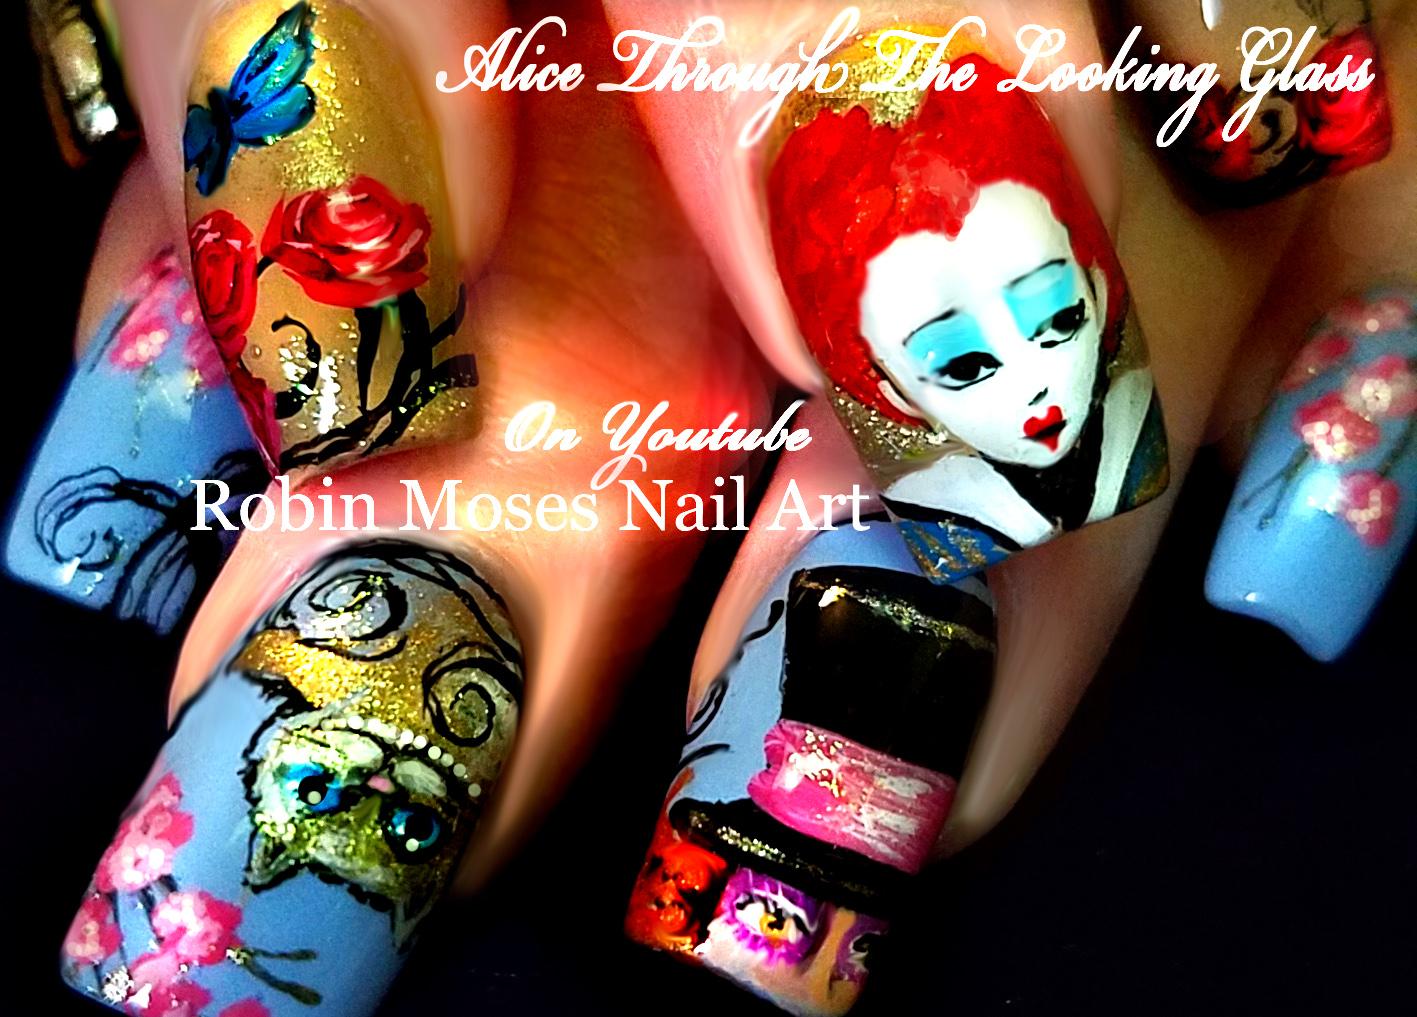 Robin Moses Nail Art: Alice Through the Looking Glass nail ...